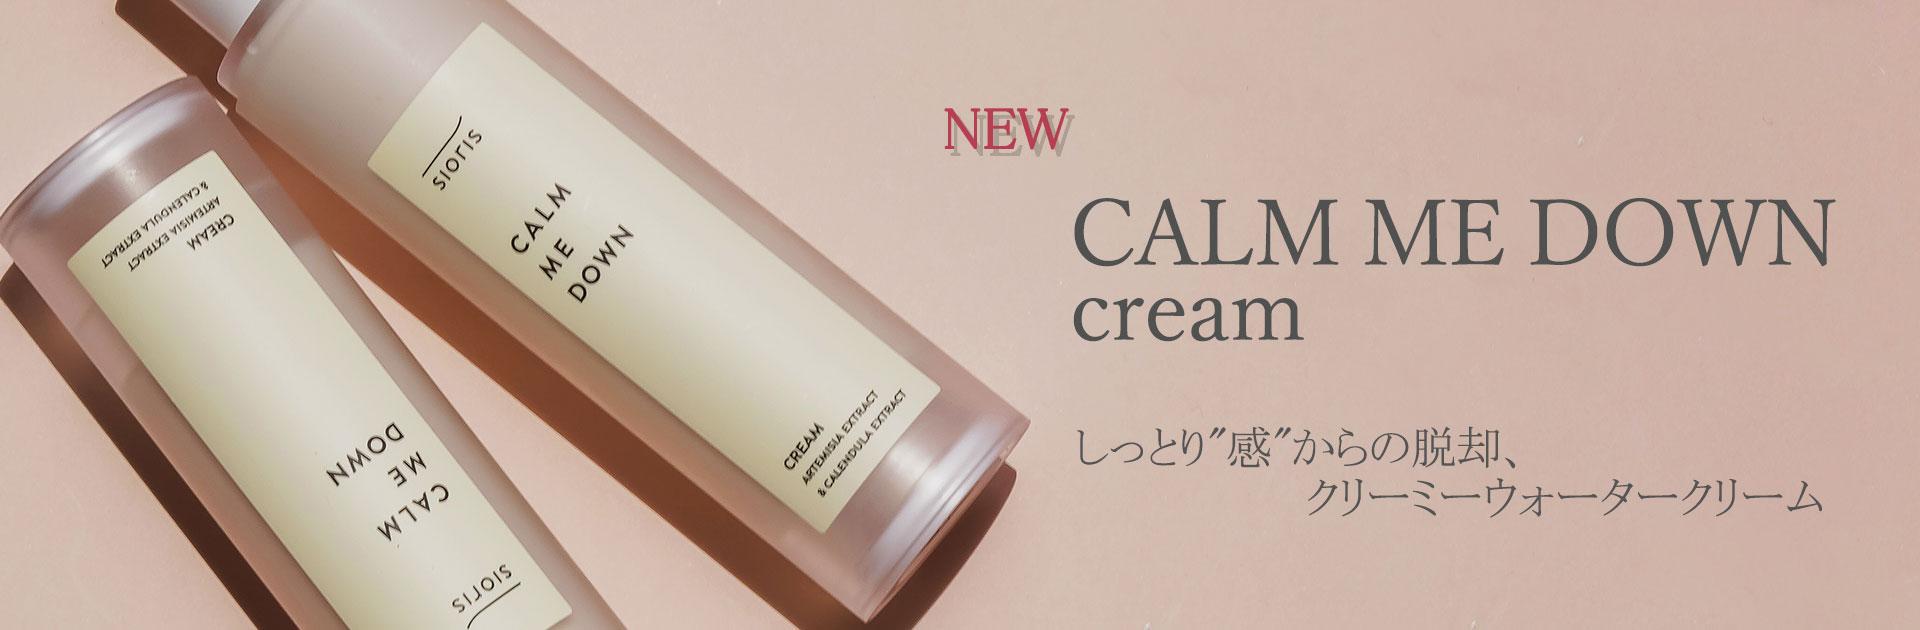 clam-me-down-cream-バナー.jpg